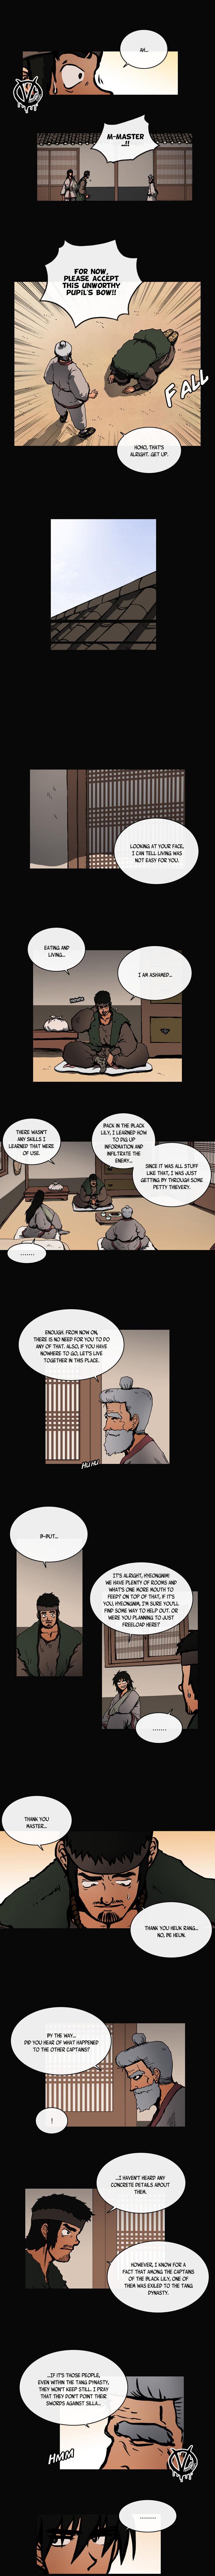 Be Heun 38 Page 3